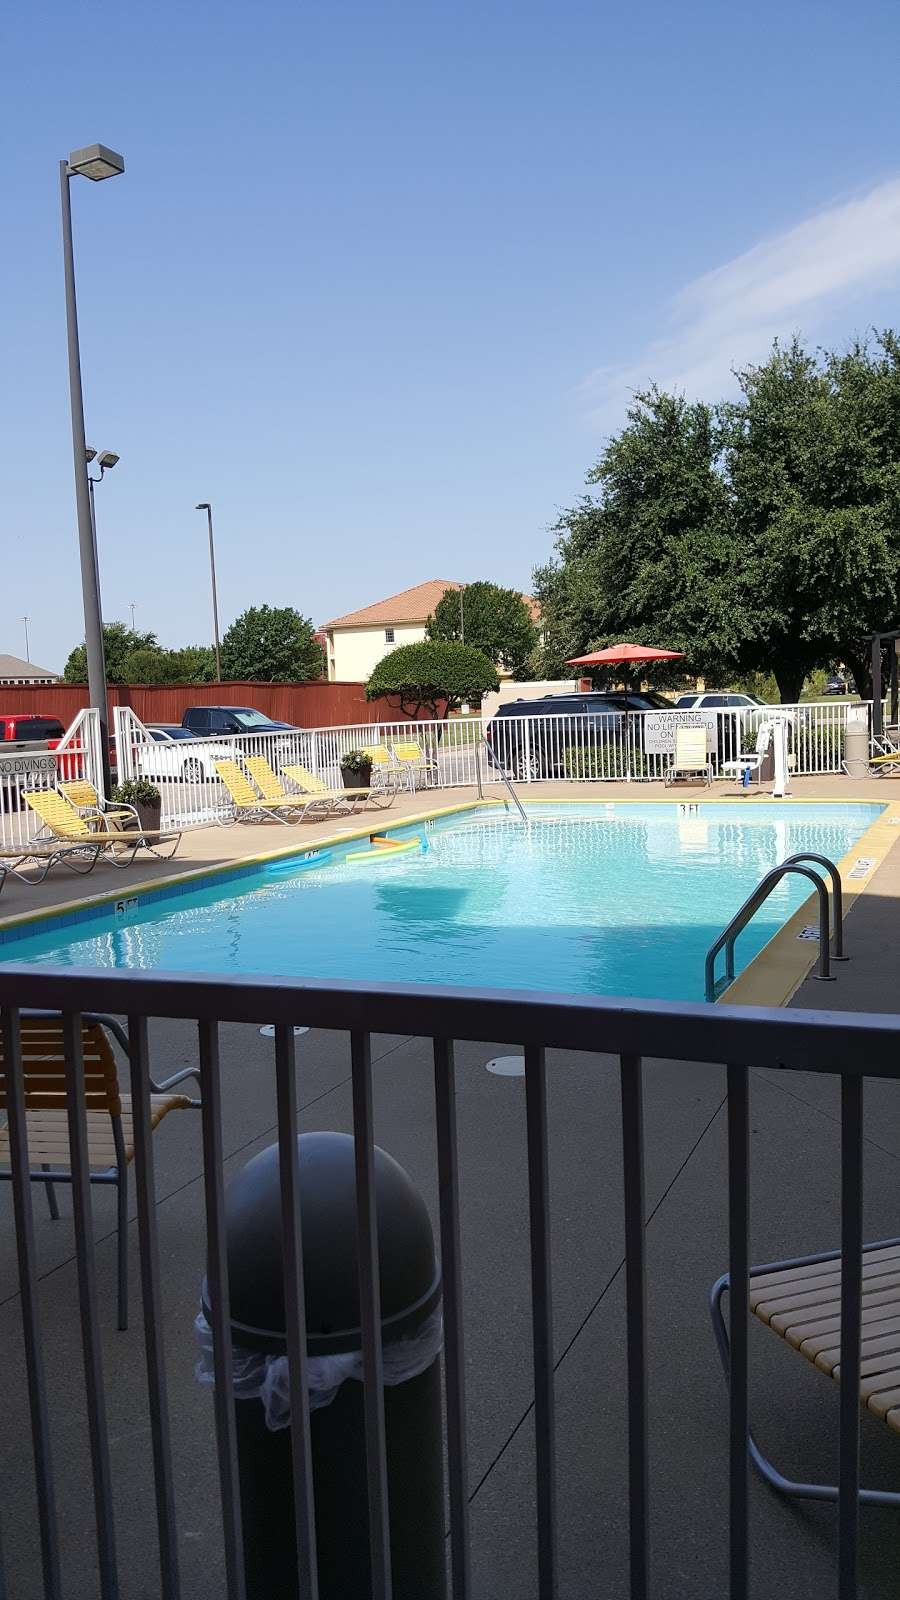 Fairfield Inn & Suites by Marriott Dallas DFW Airport North/Irvi - lodging  | Photo 2 of 9 | Address: 4800 W John Carpenter Fwy, Irving, TX 75063, USA | Phone: (972) 929-7257